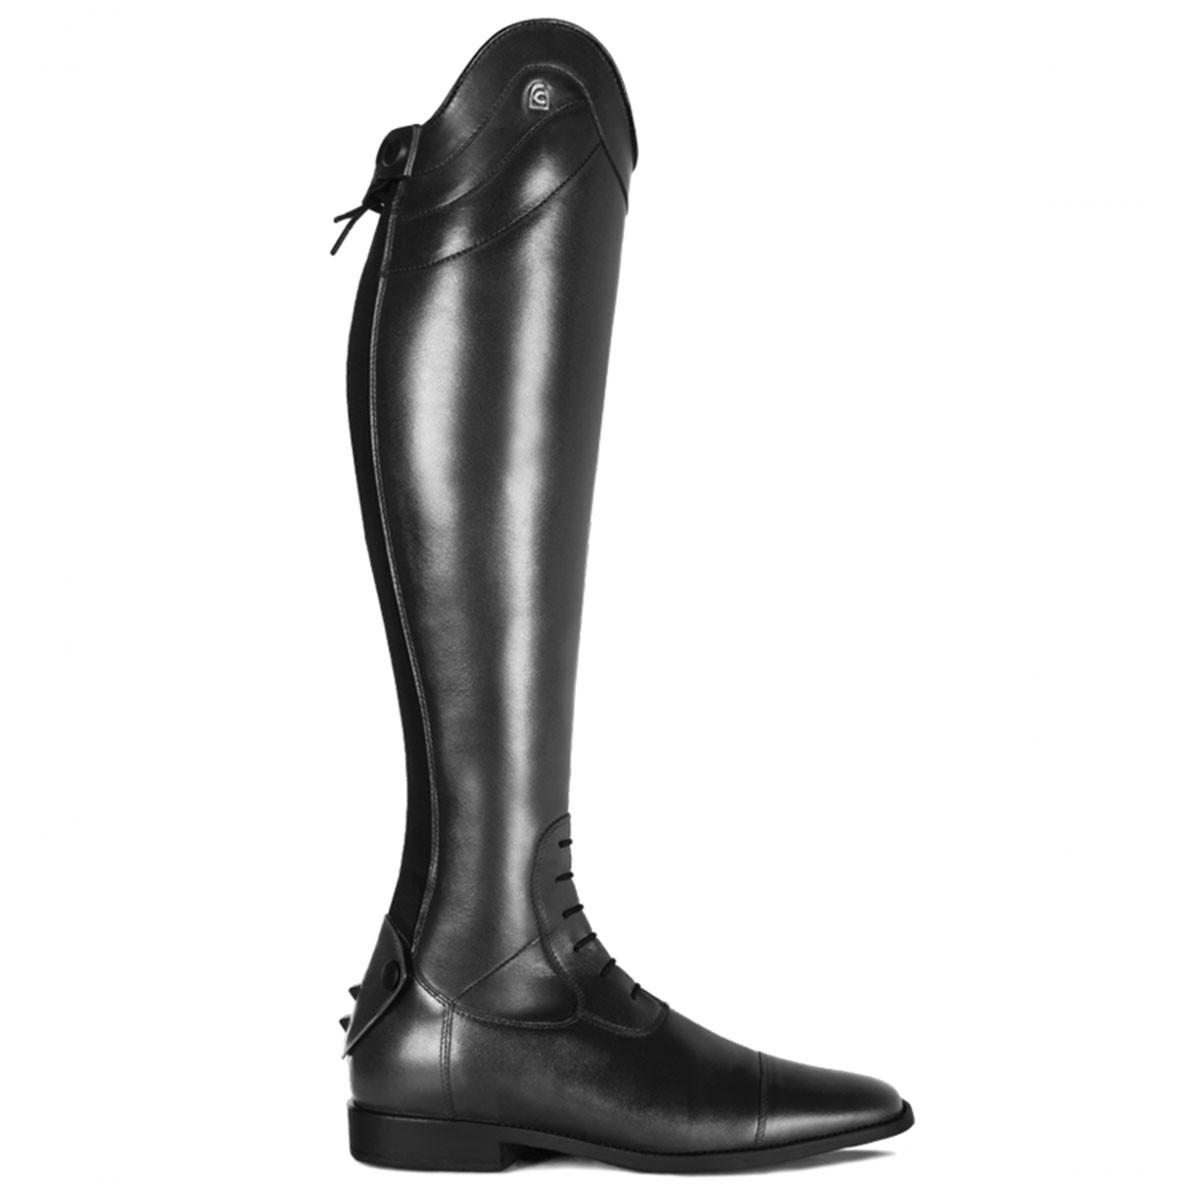 Cavallo Linus Slim rijlaars zwart maat:6-6.5 / h51-w36